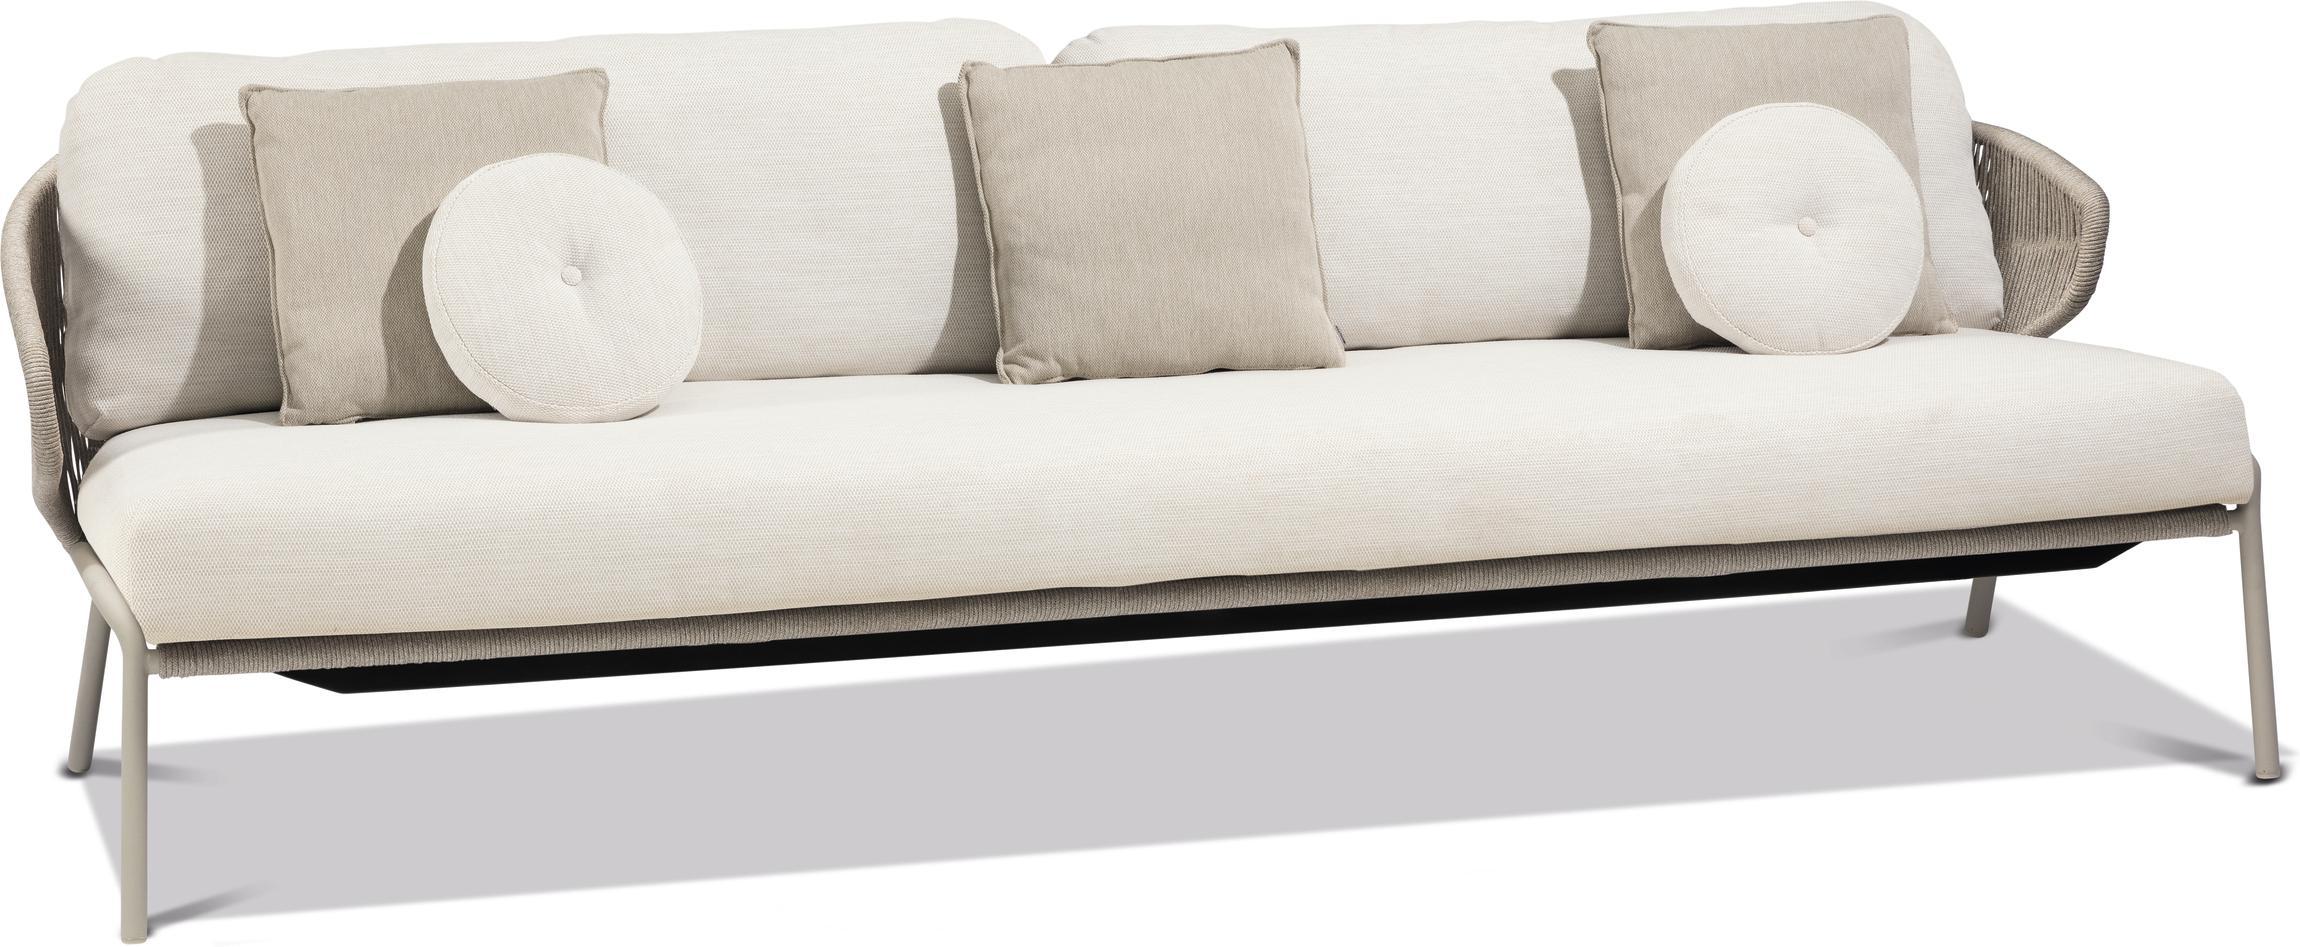 Radius 3 seater - Sofa fixed - flint - pepper